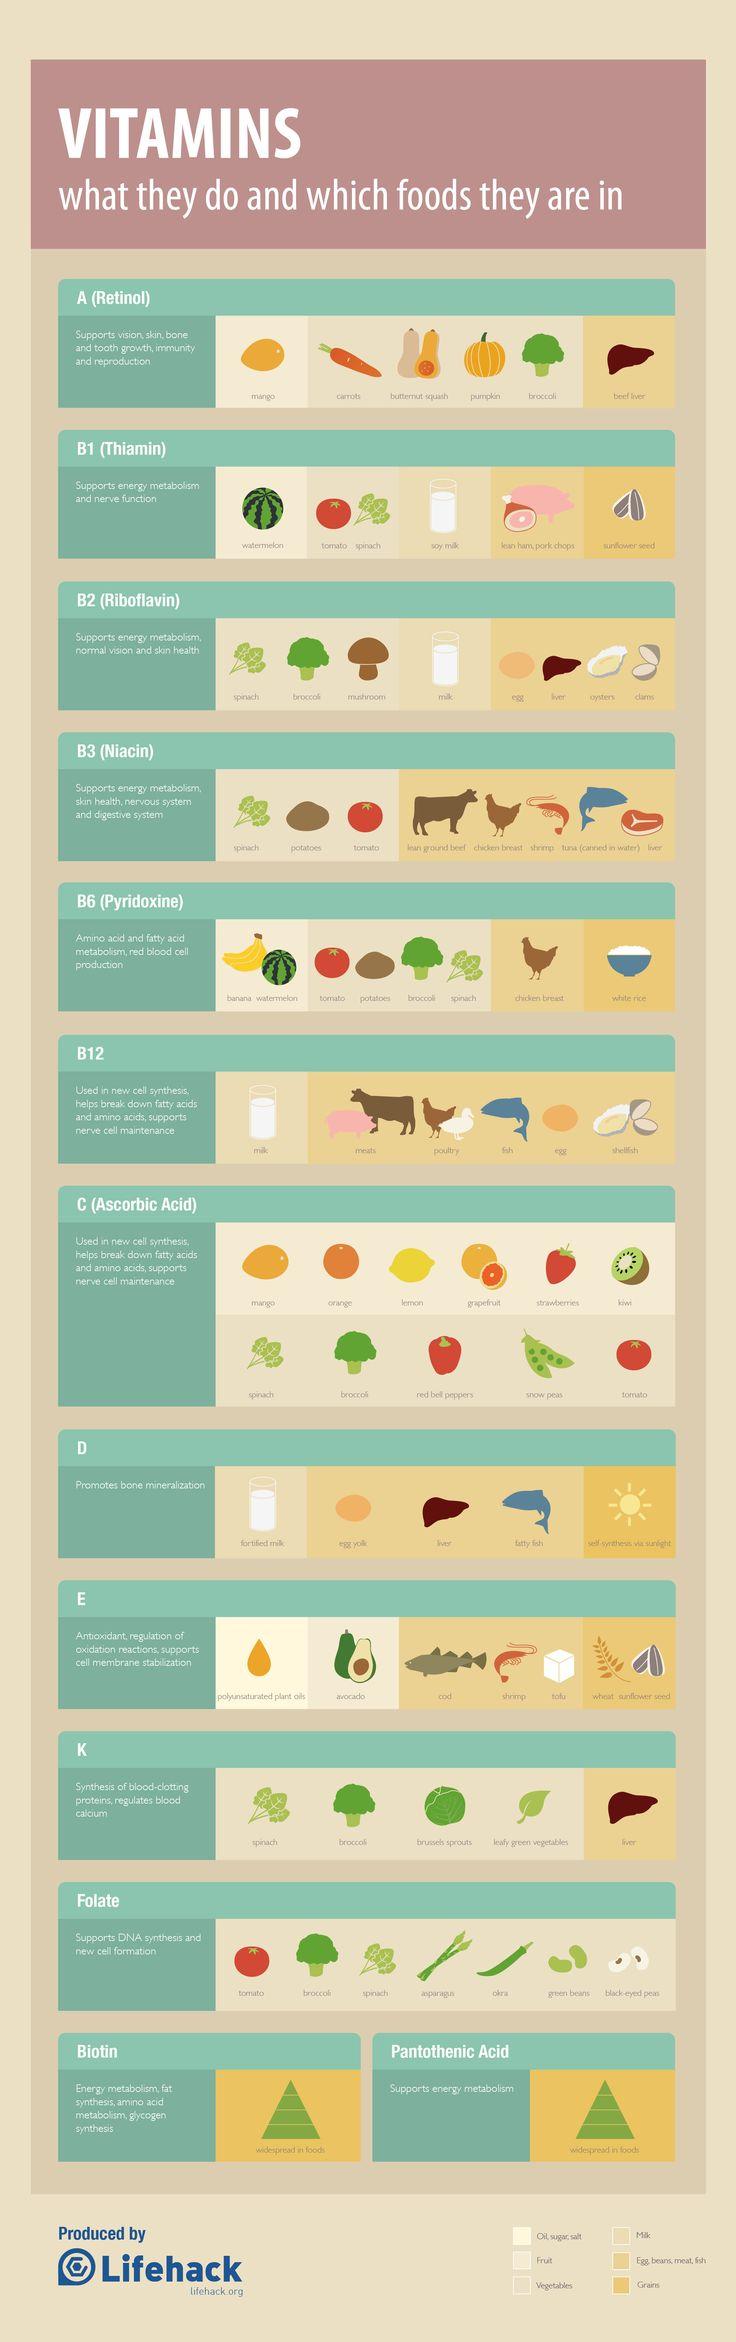 Vitamins #Vitamins #Infographic